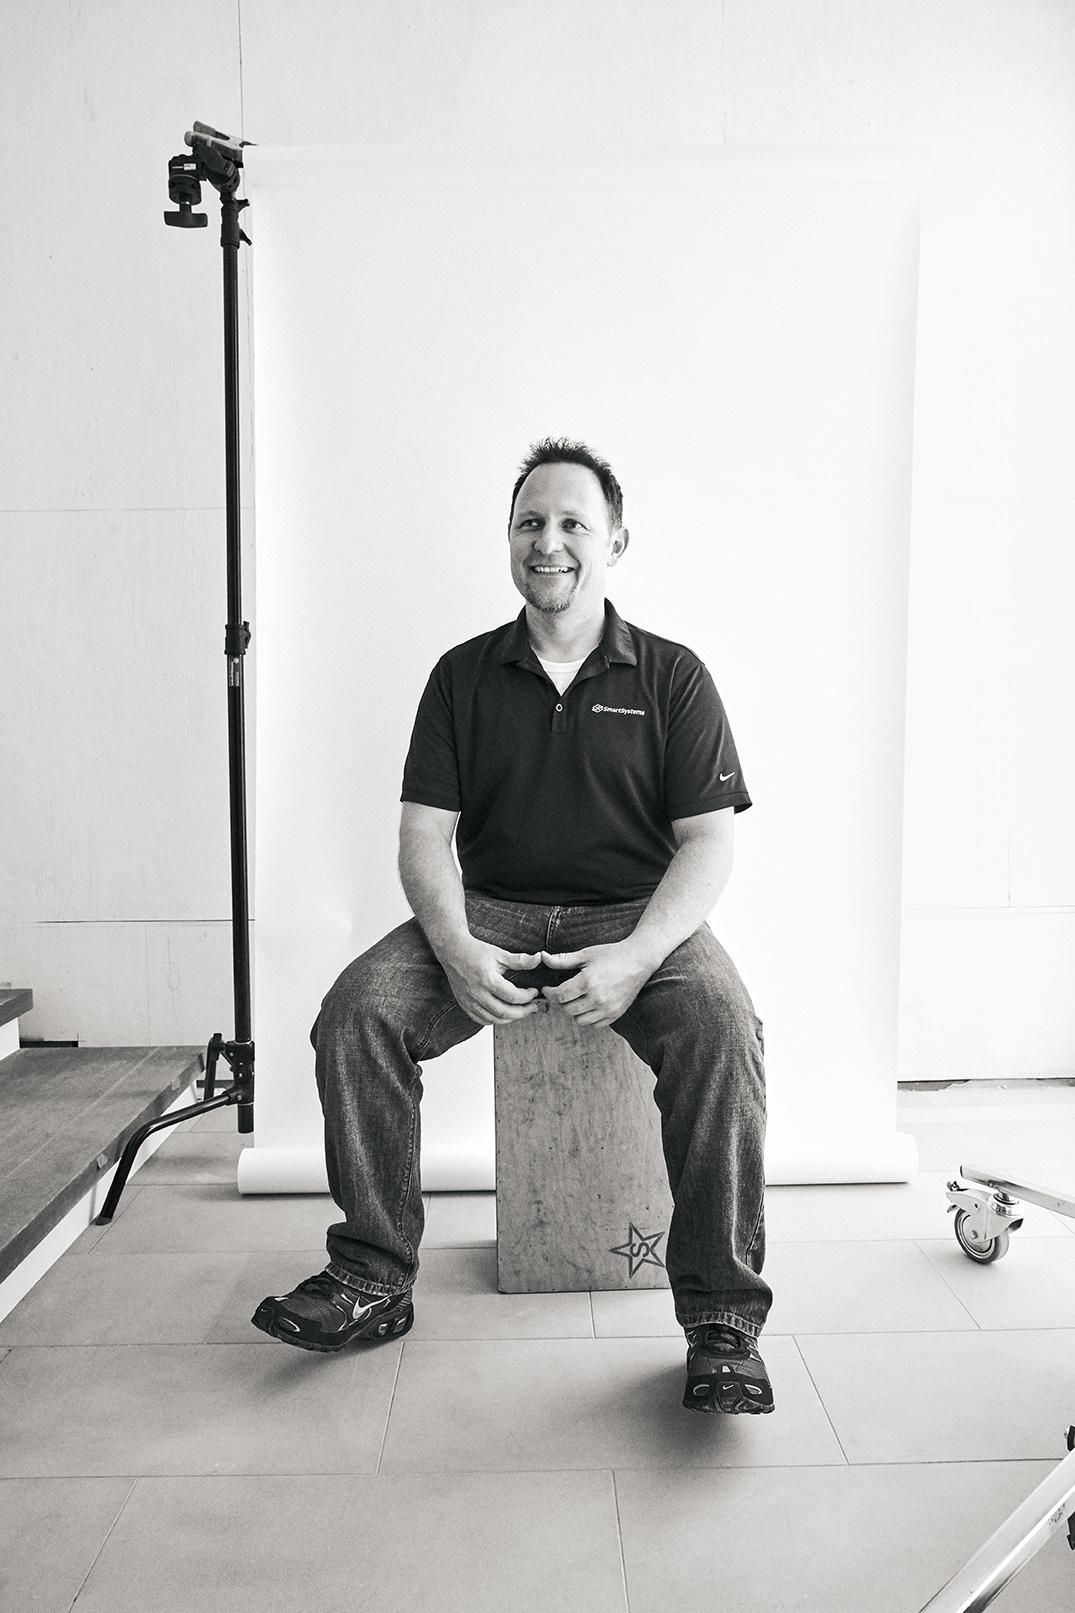 Greg Ashford  | Smart Homes AV and Lighting Control Specialist. Husband. Proud dad of hockey player.